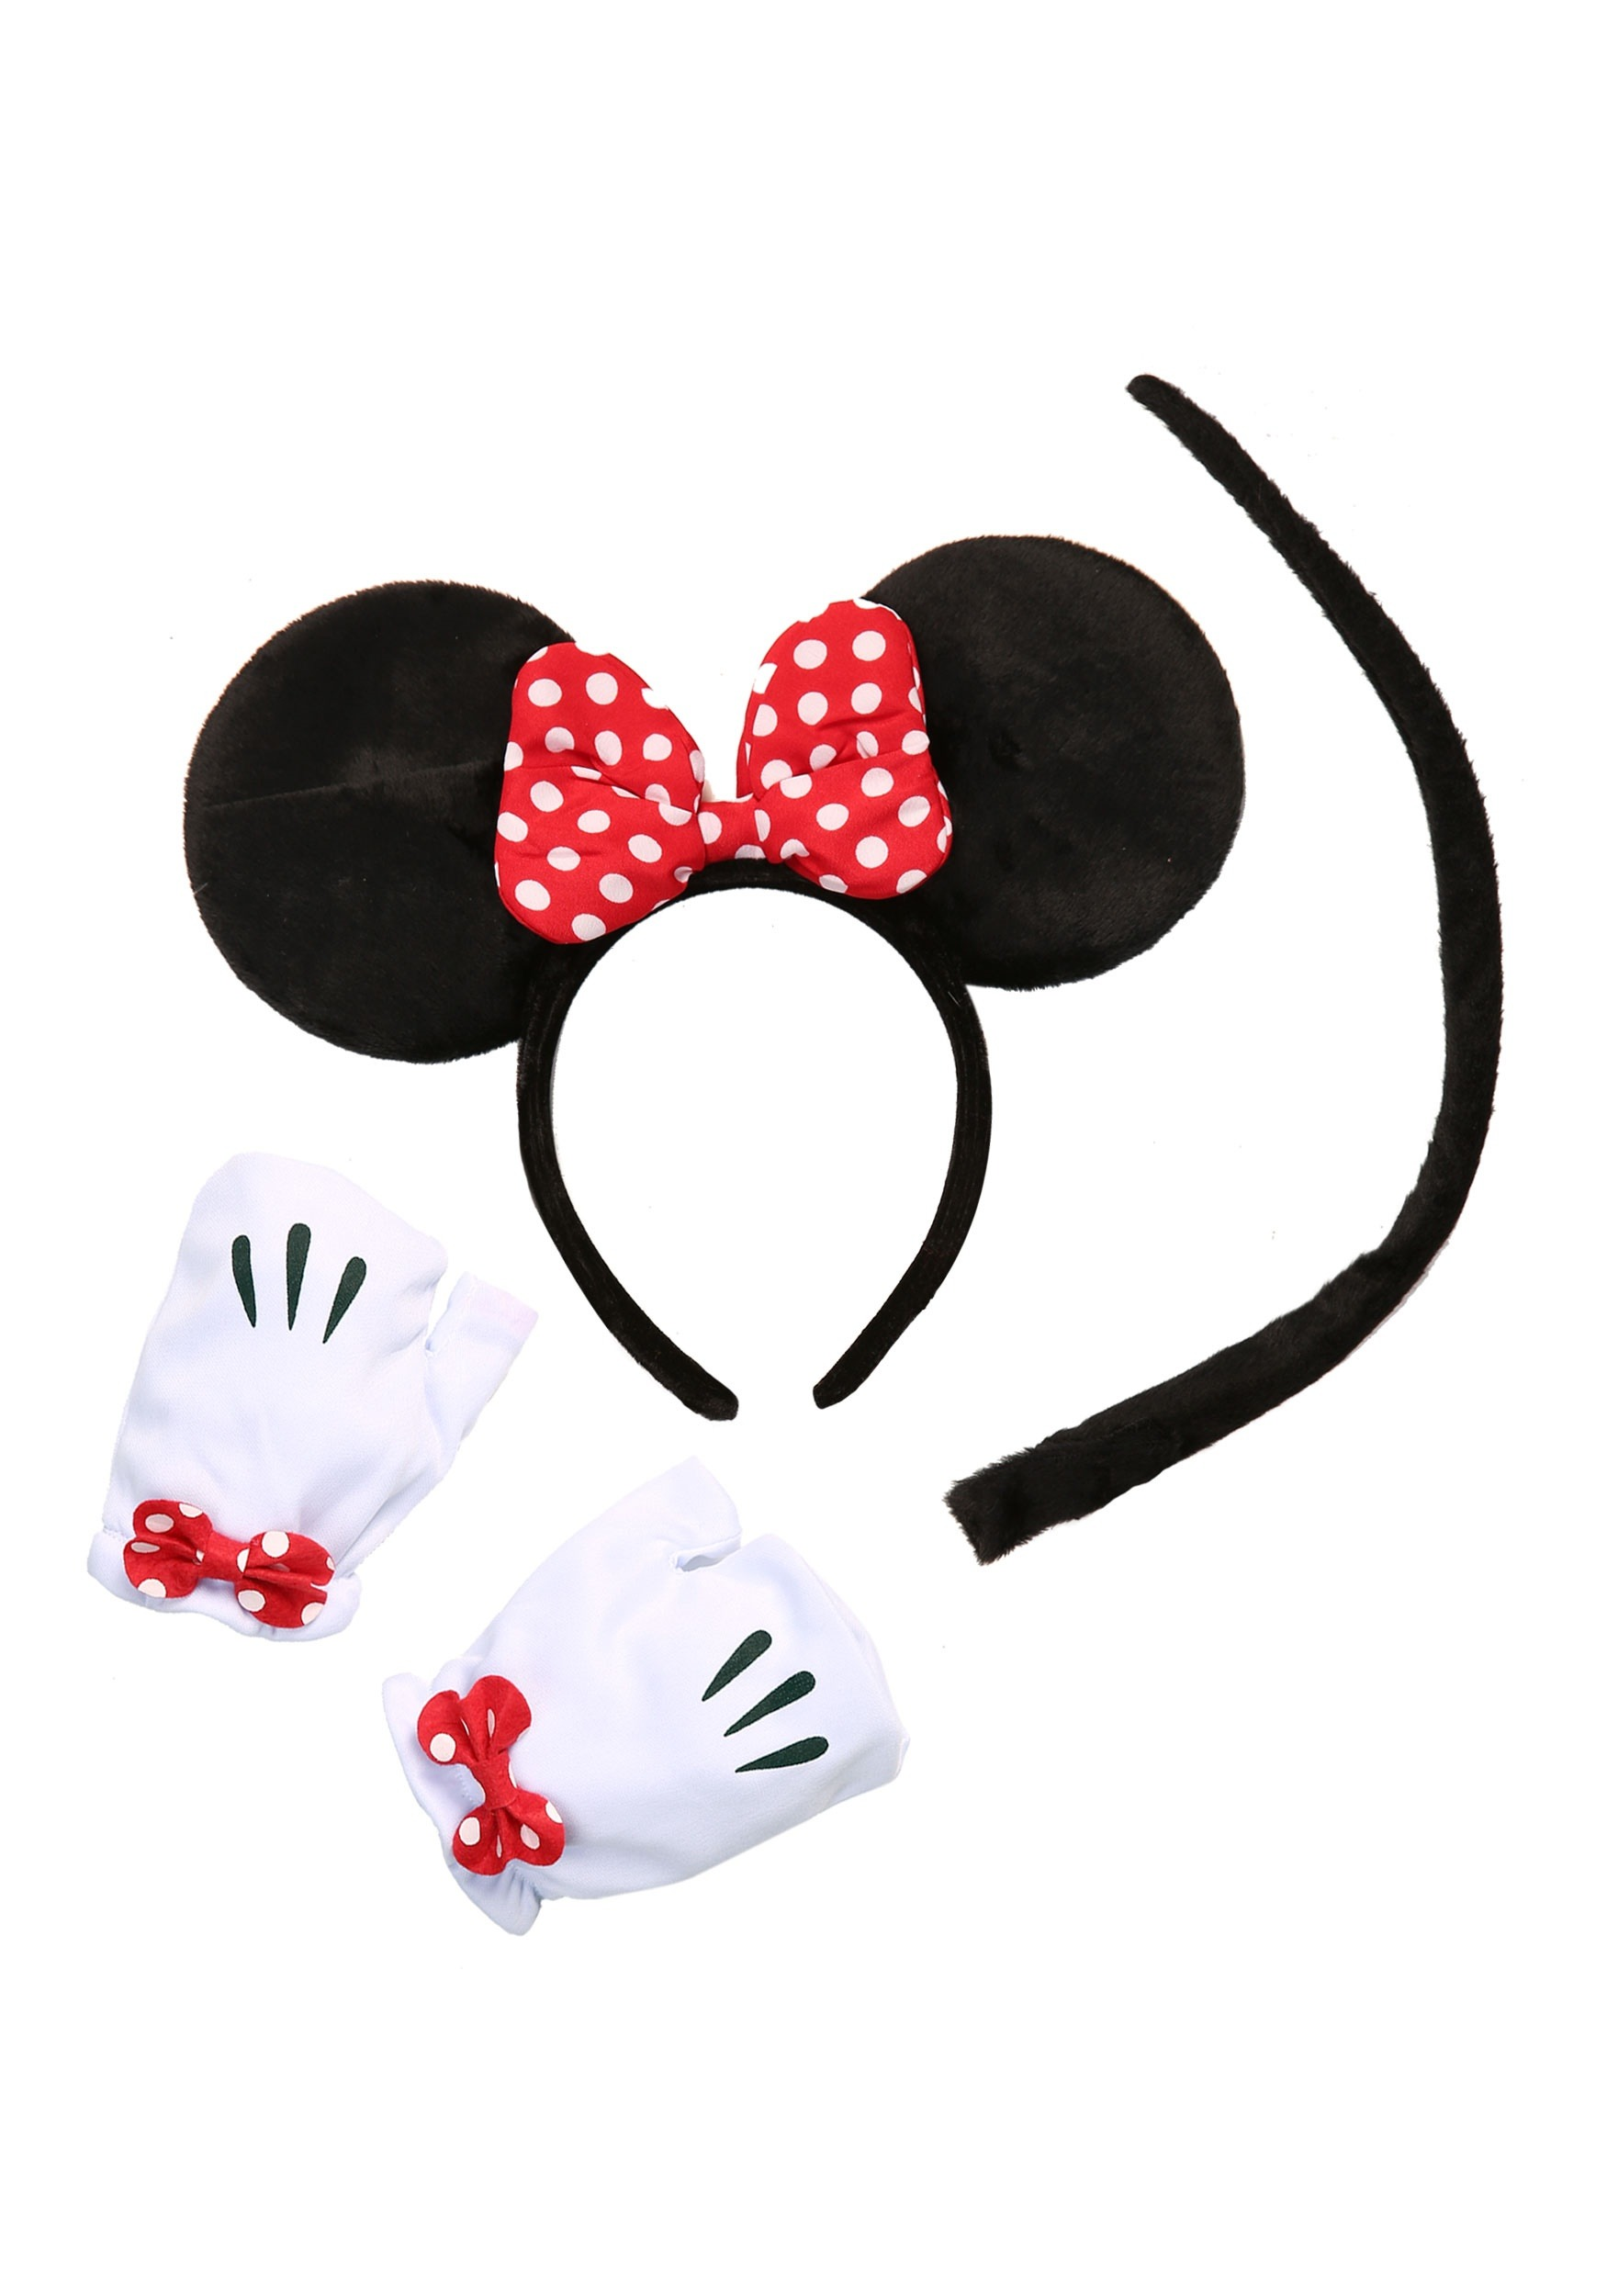 986cef0b6ce Minnie Mouse Tail Accessory Kit1